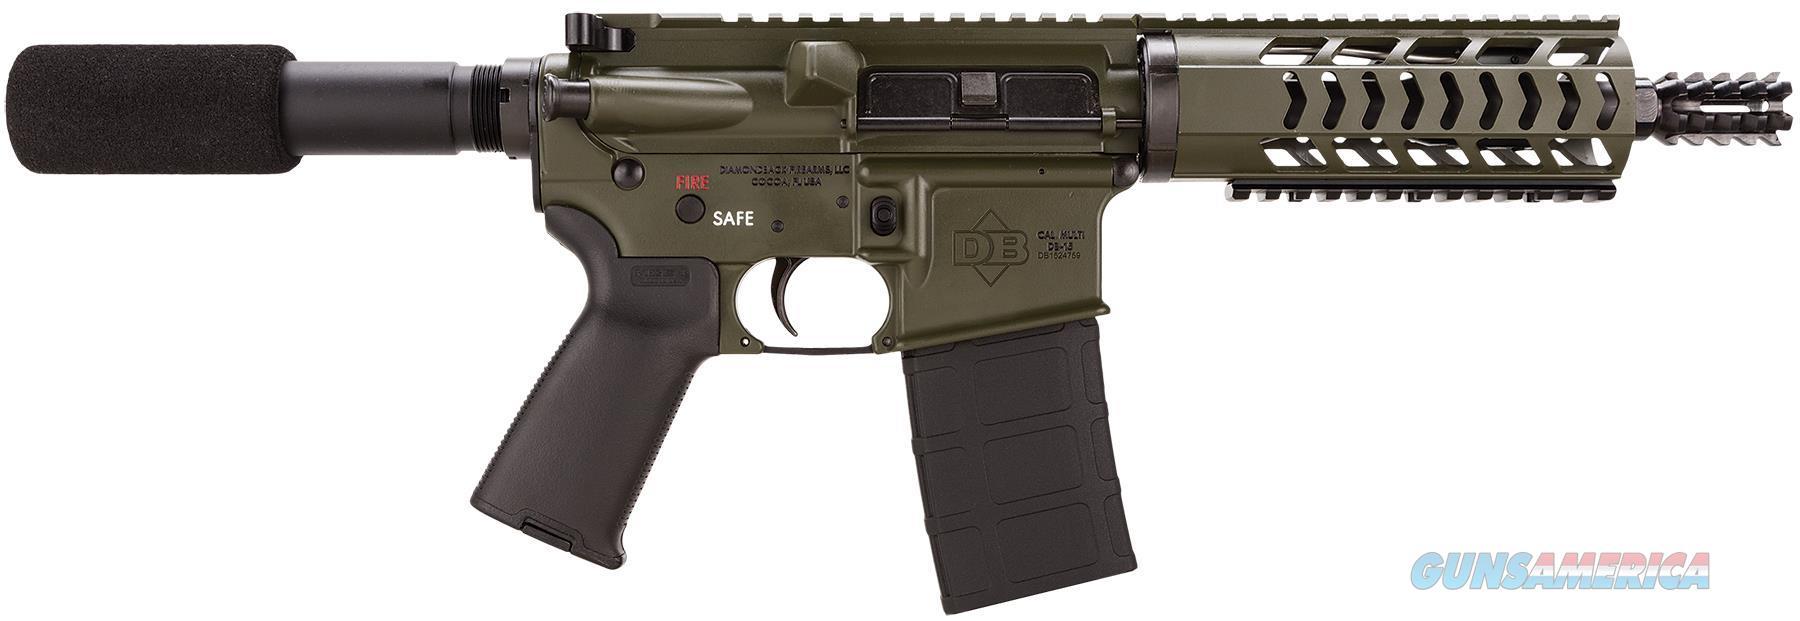 "Diamondback Db15podg7 Db15 Ar Pistol Semi-Automatic 223 Remington/5.56 Nato 7.5"" 30+1  Olive Drab Cerakote Receiver/Black Barrel DB15PODG7  Guns > Pistols > D Misc Pistols"